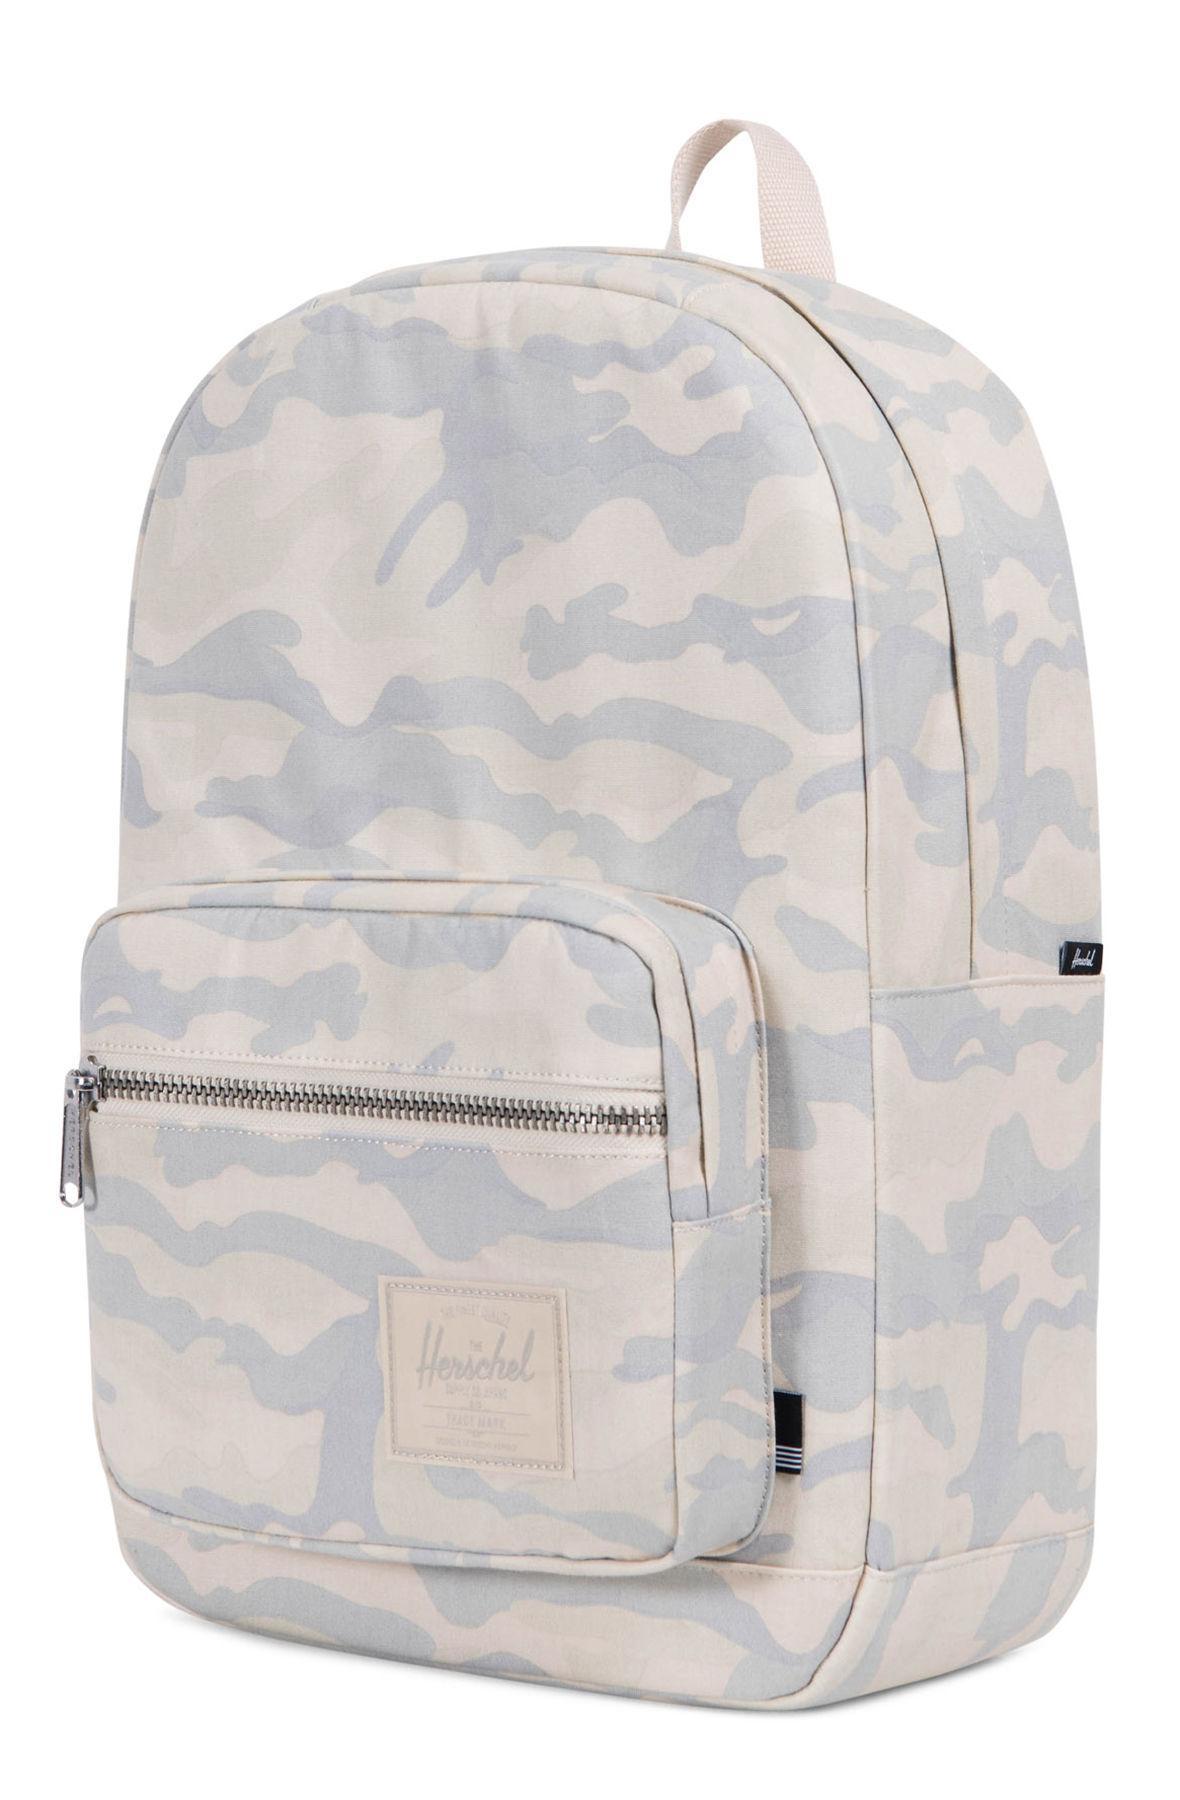 ceb66bb6113 Washing Herschel Backpack